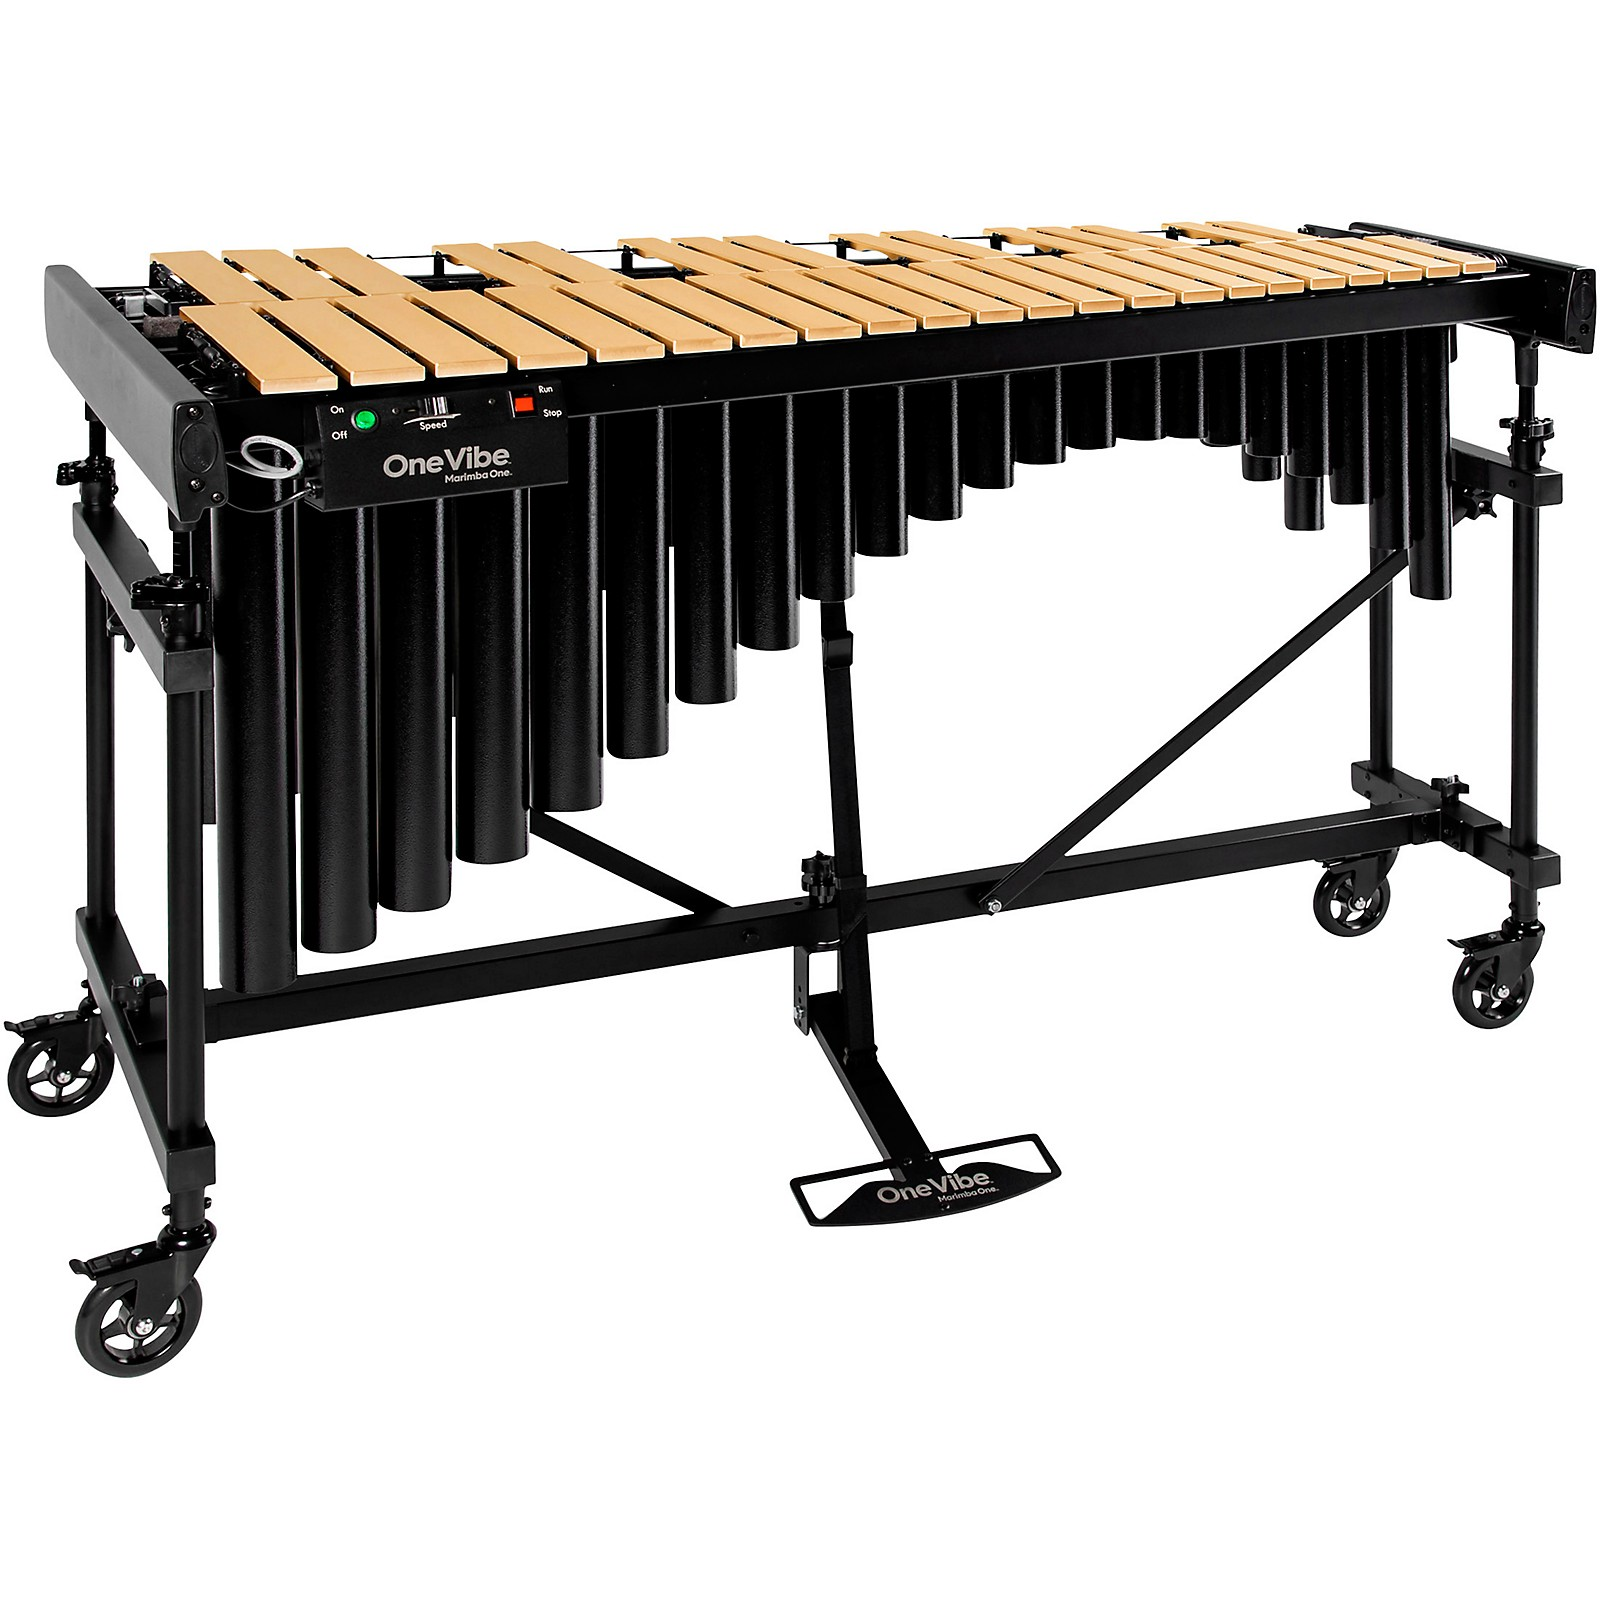 Marimba One One Vibe 3 Octave Vibraphone A442